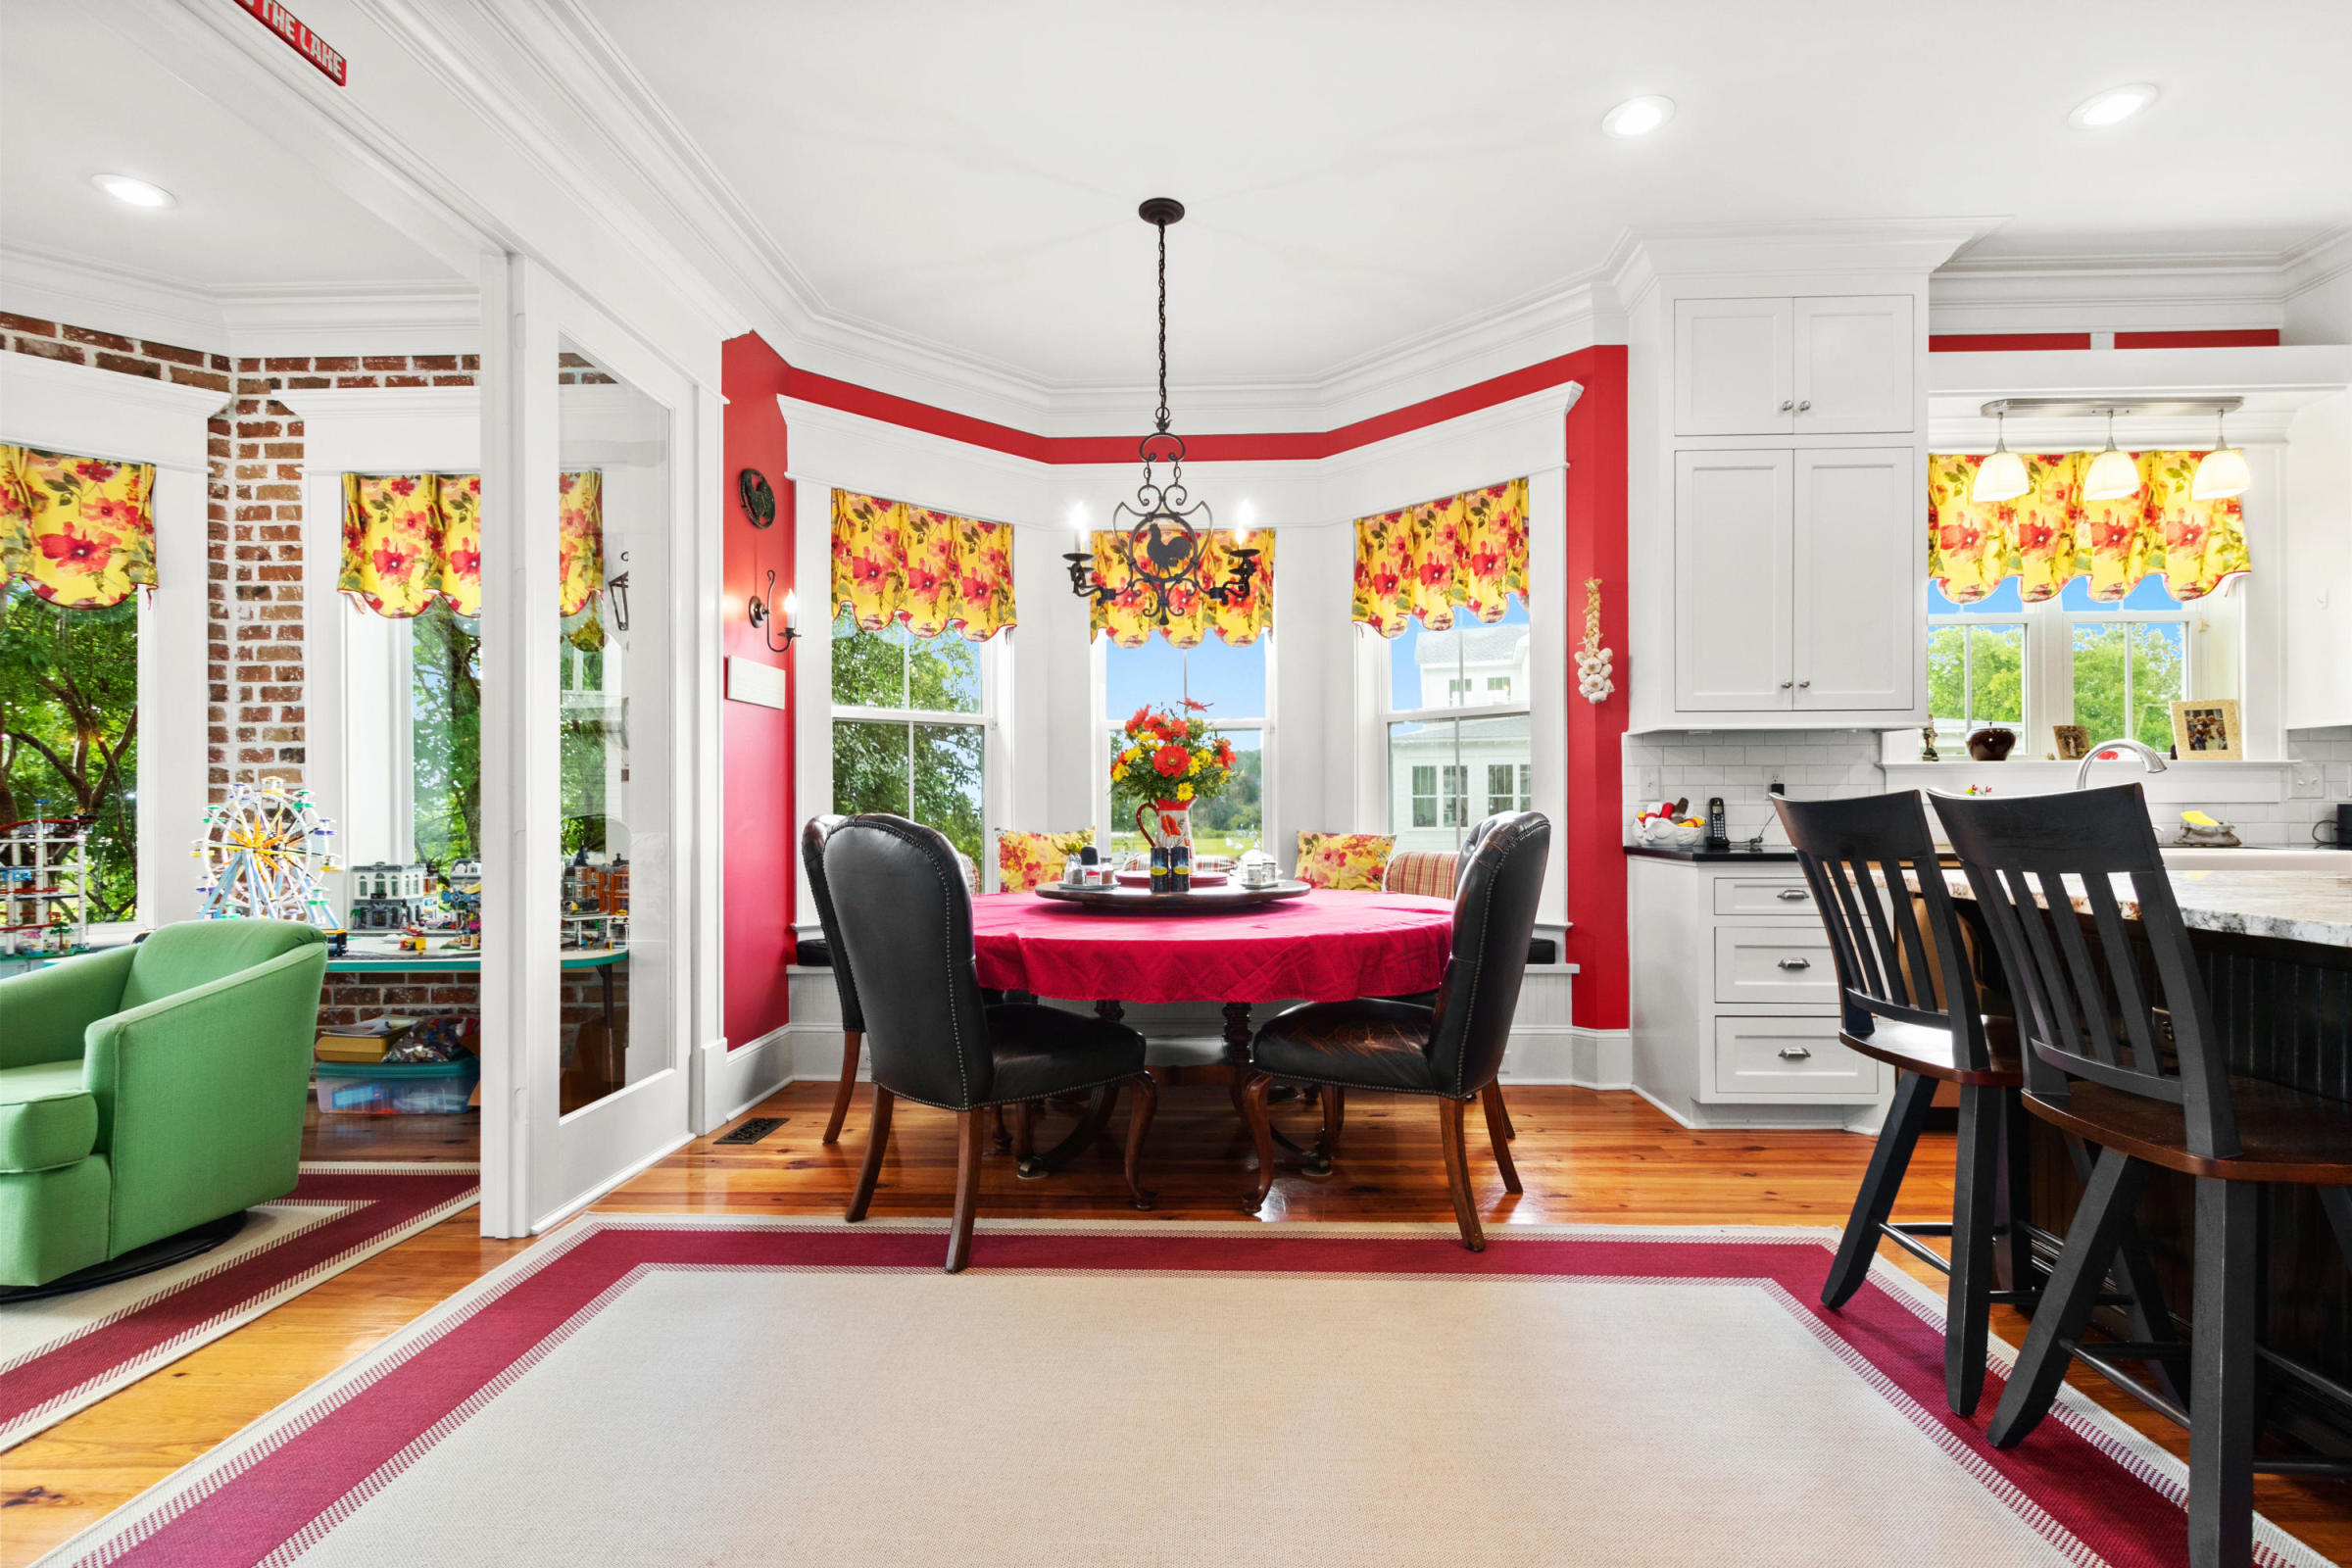 Broughton Hall Homes For Sale - 2058 Lakeshore, Pinopolis, SC - 12